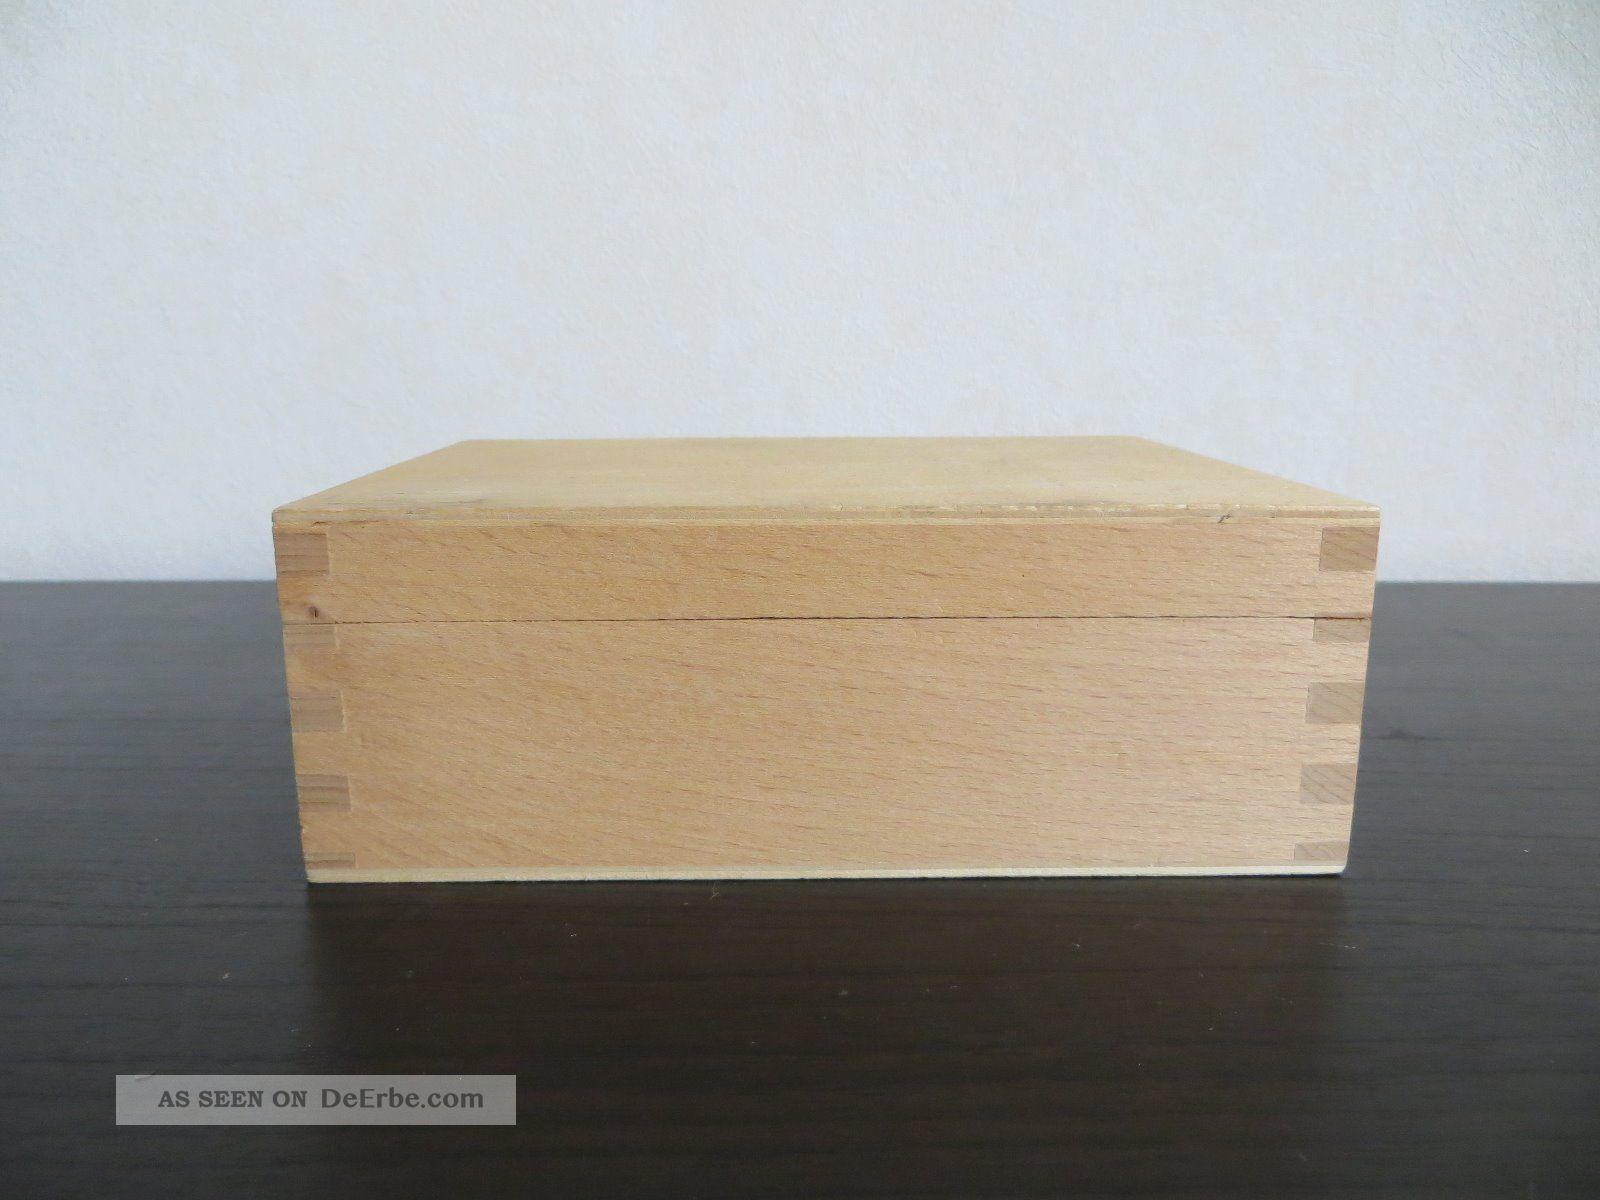 holzkiste kiste aus holz box schatulle unbehandelt zum basteln kleinkram knorr. Black Bedroom Furniture Sets. Home Design Ideas